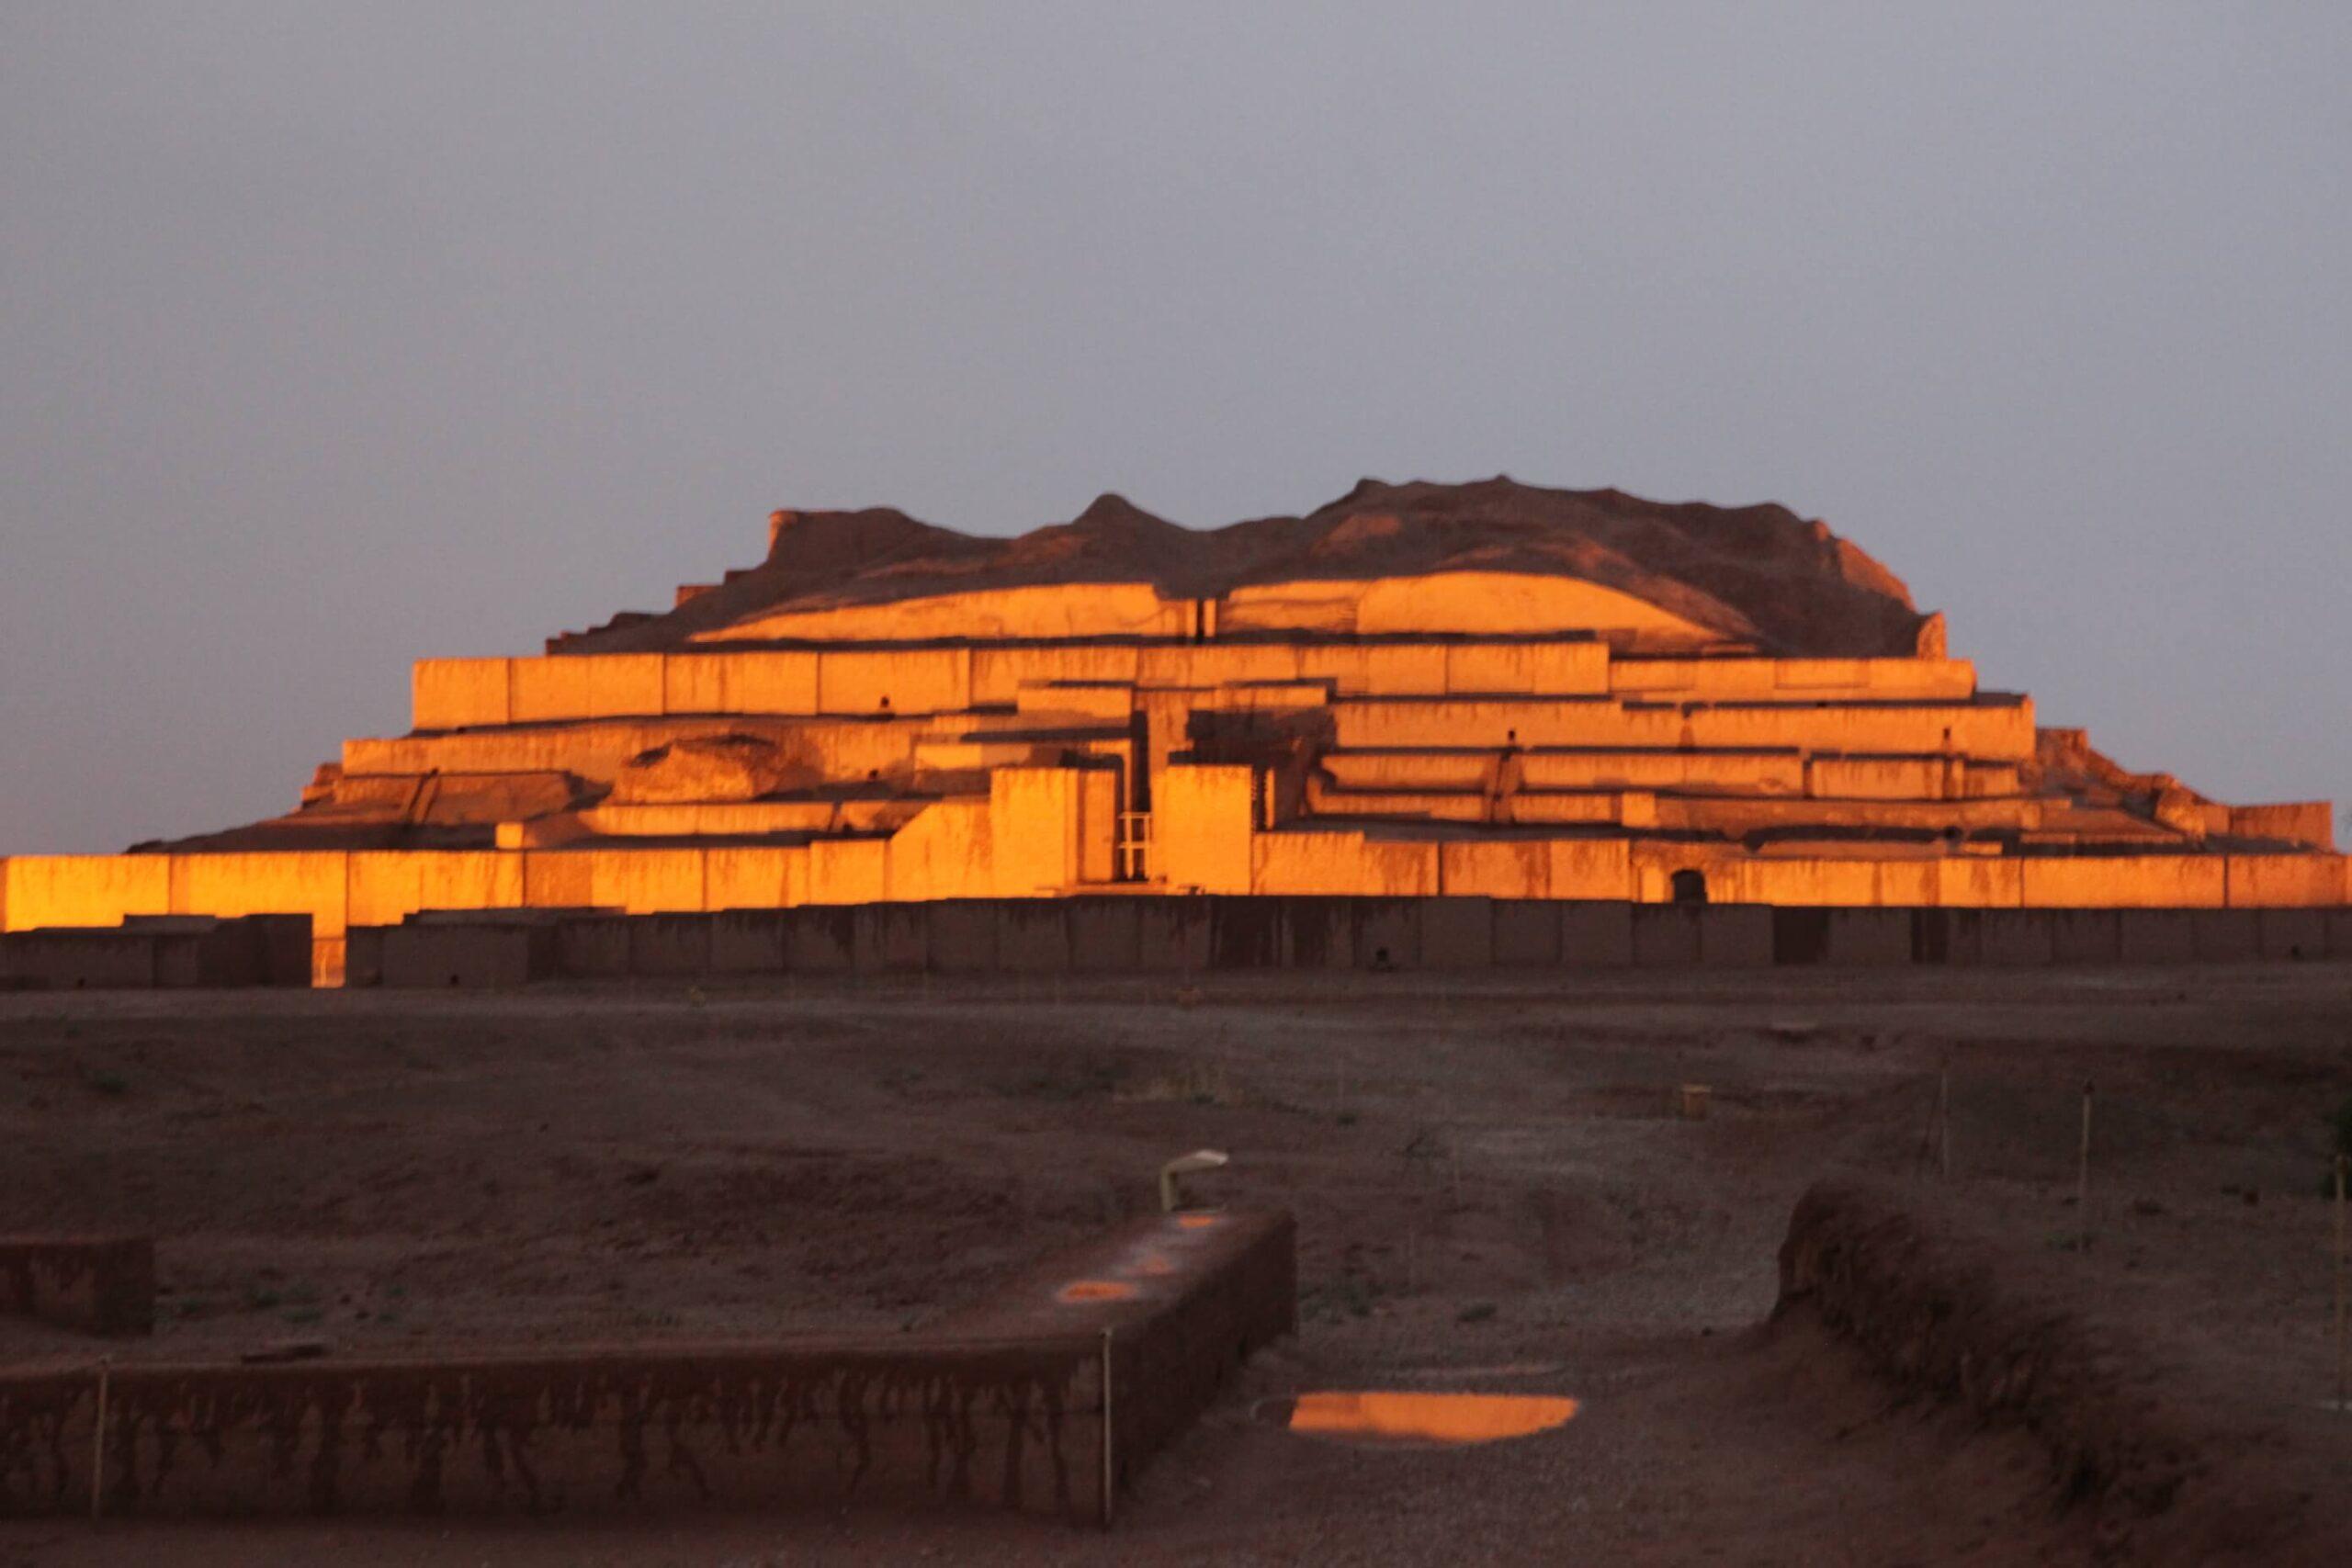 Khouzestan